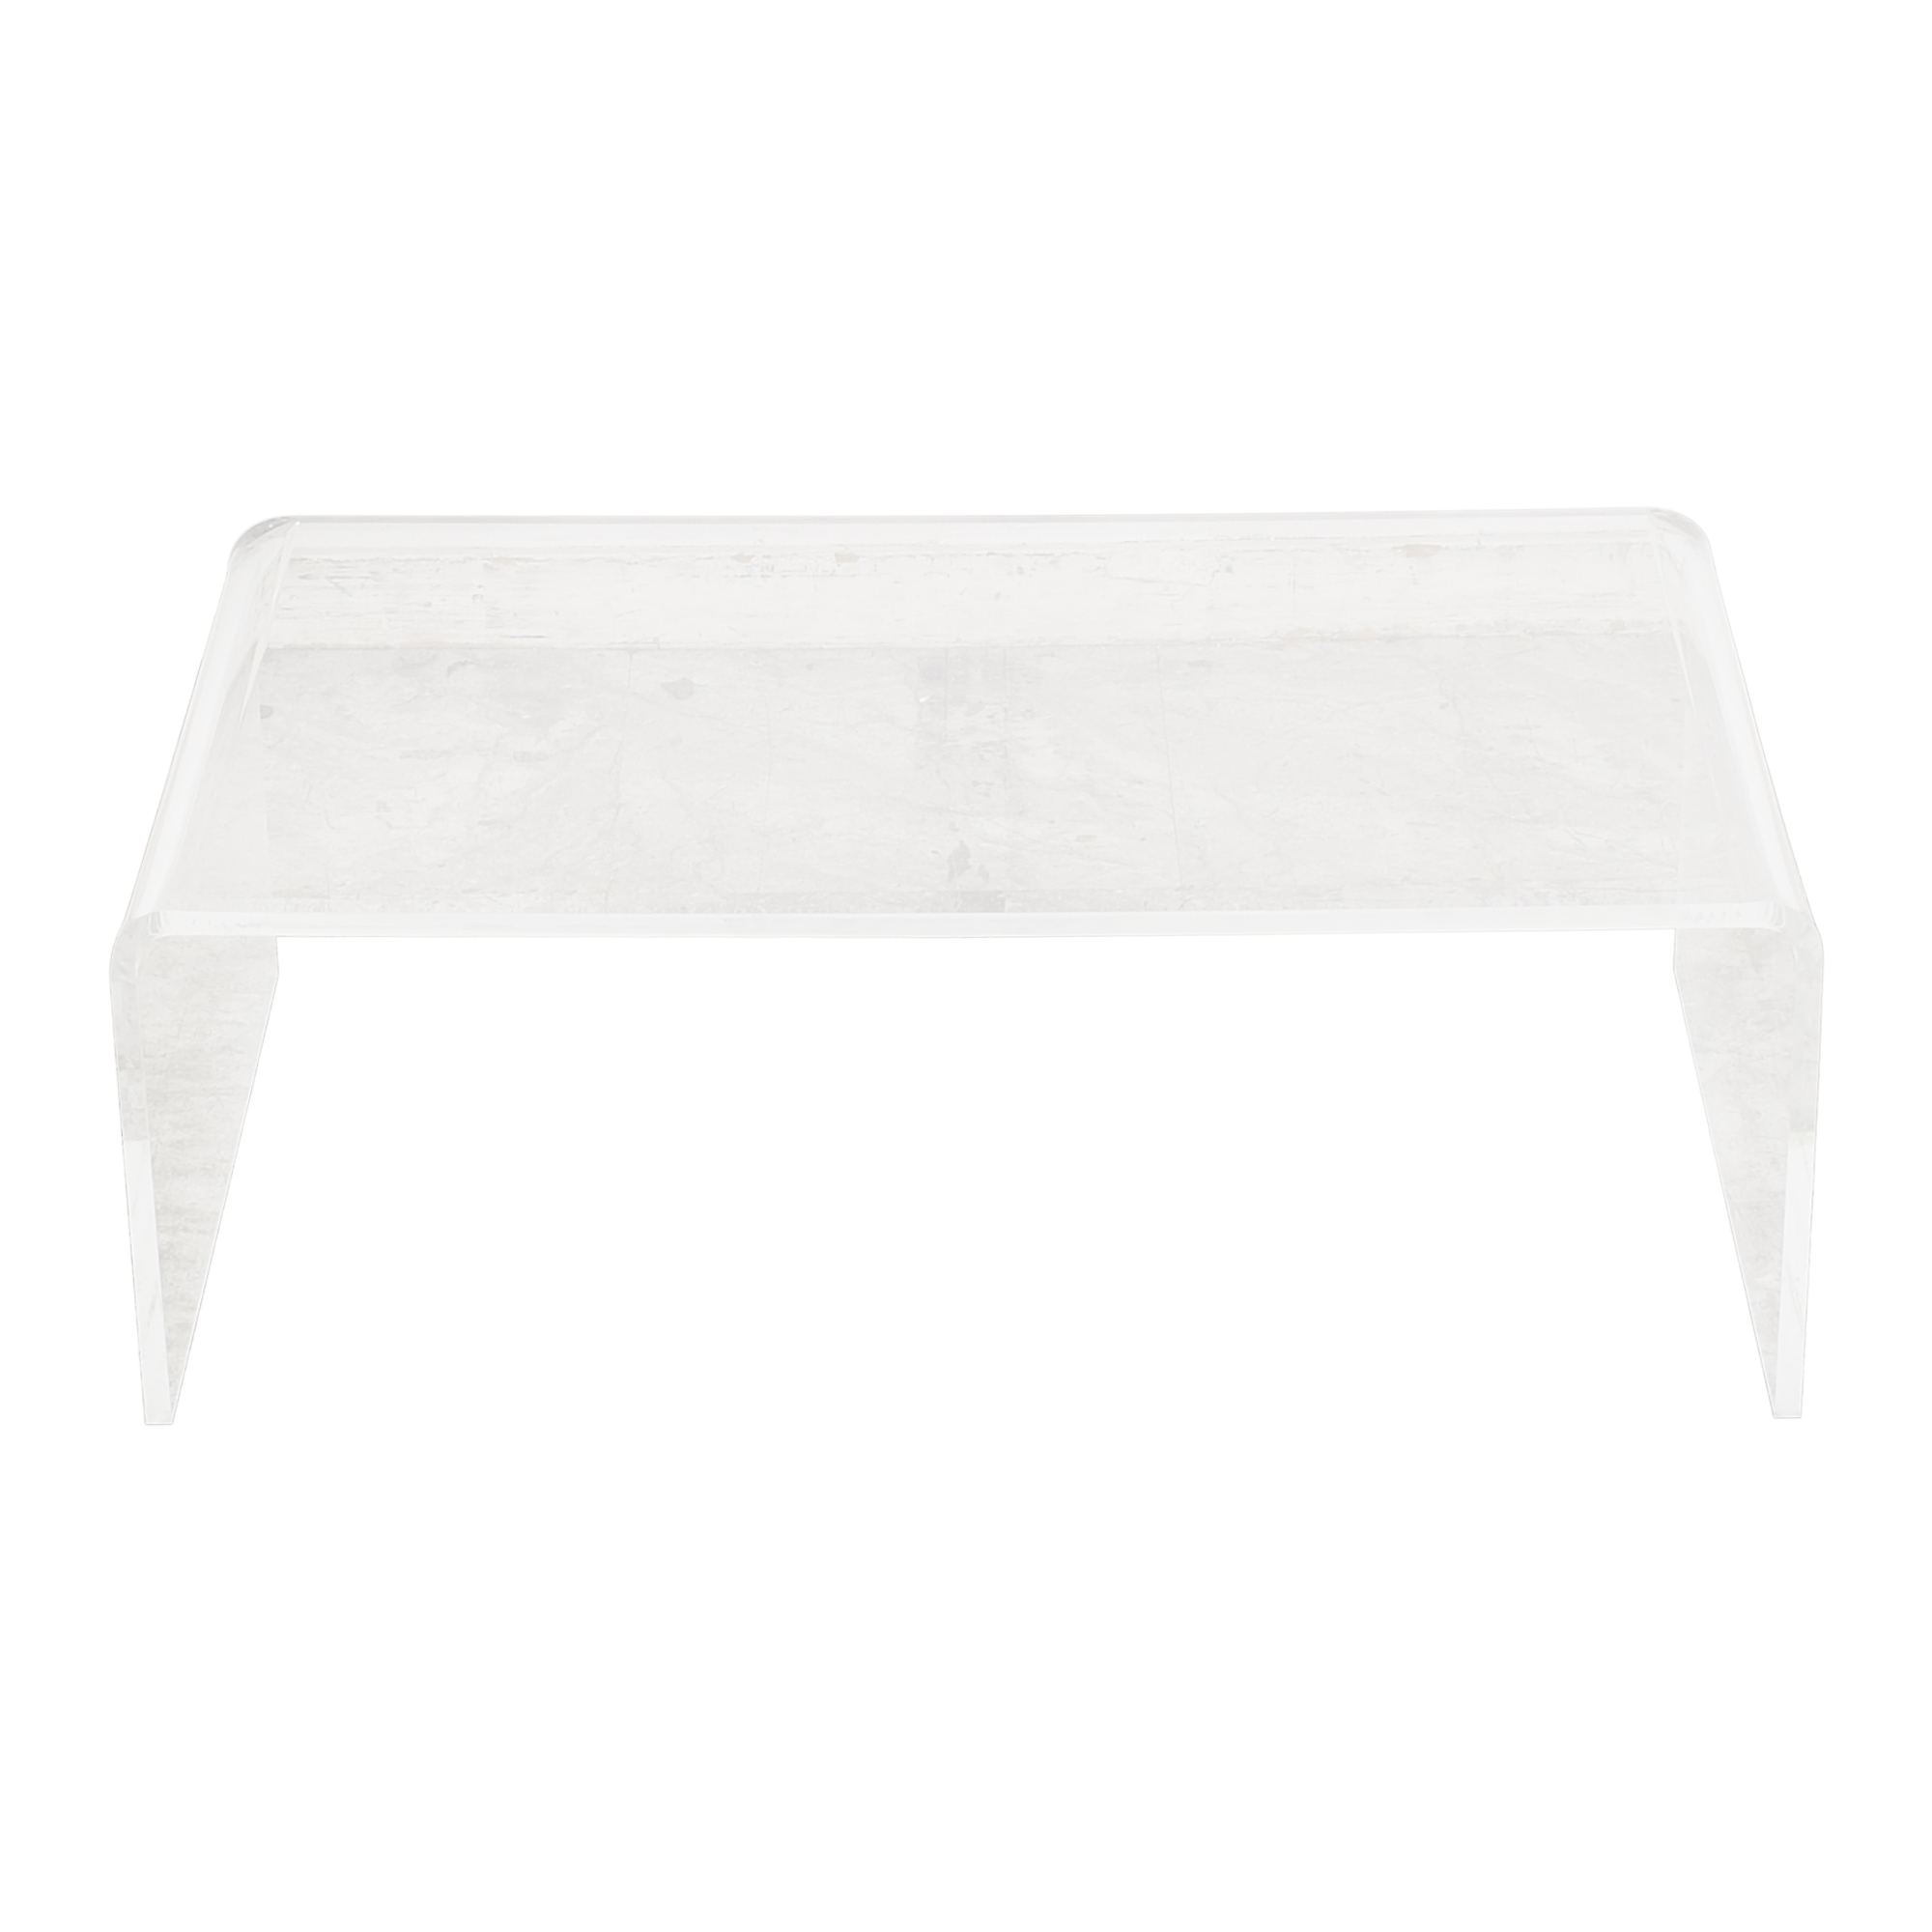 shop CB2 Peekaboo Tall Transparent Coffee Table CB2 Coffee Tables